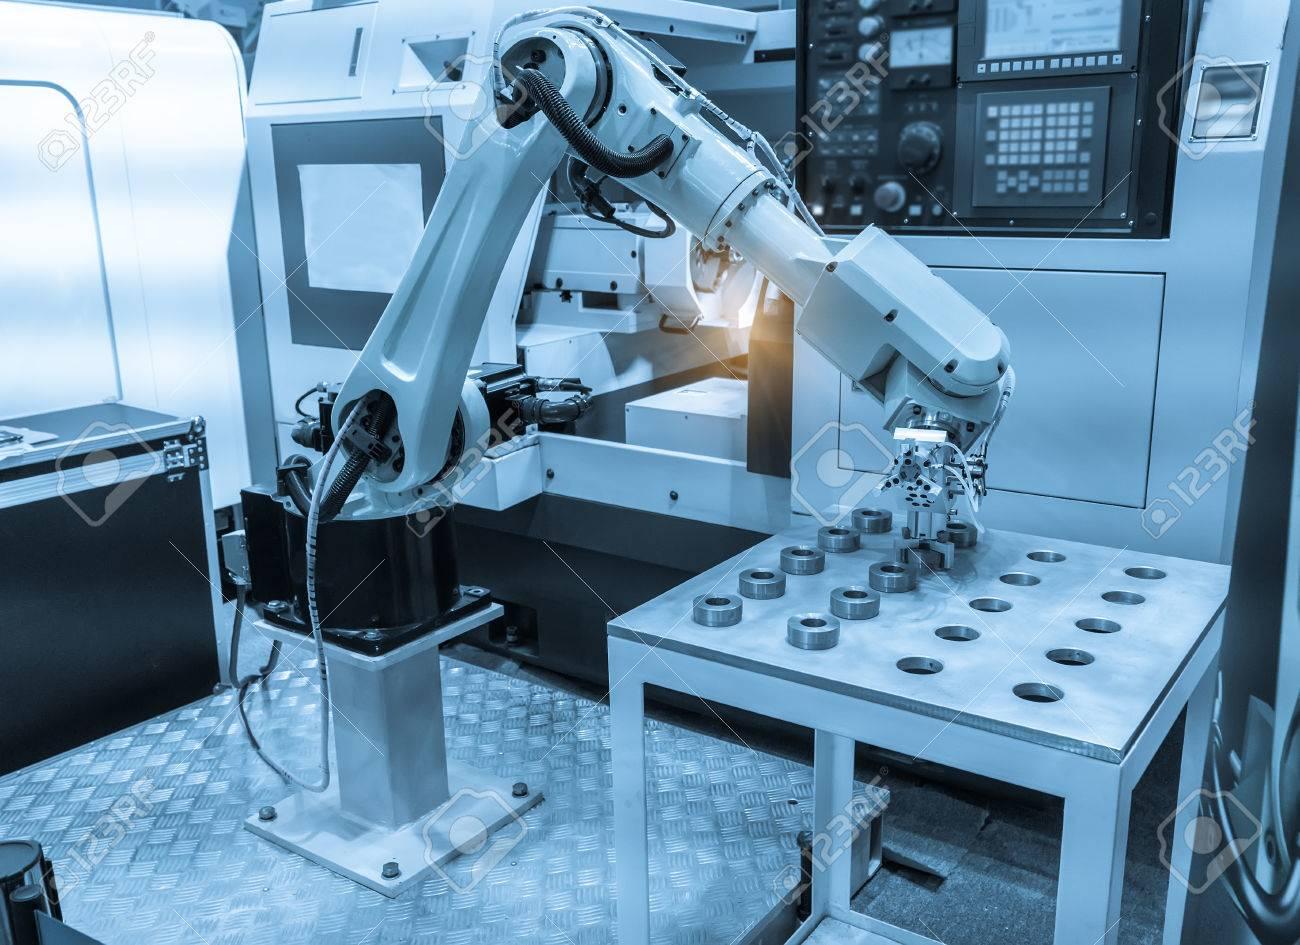 Controler of robotic hand - 56879778